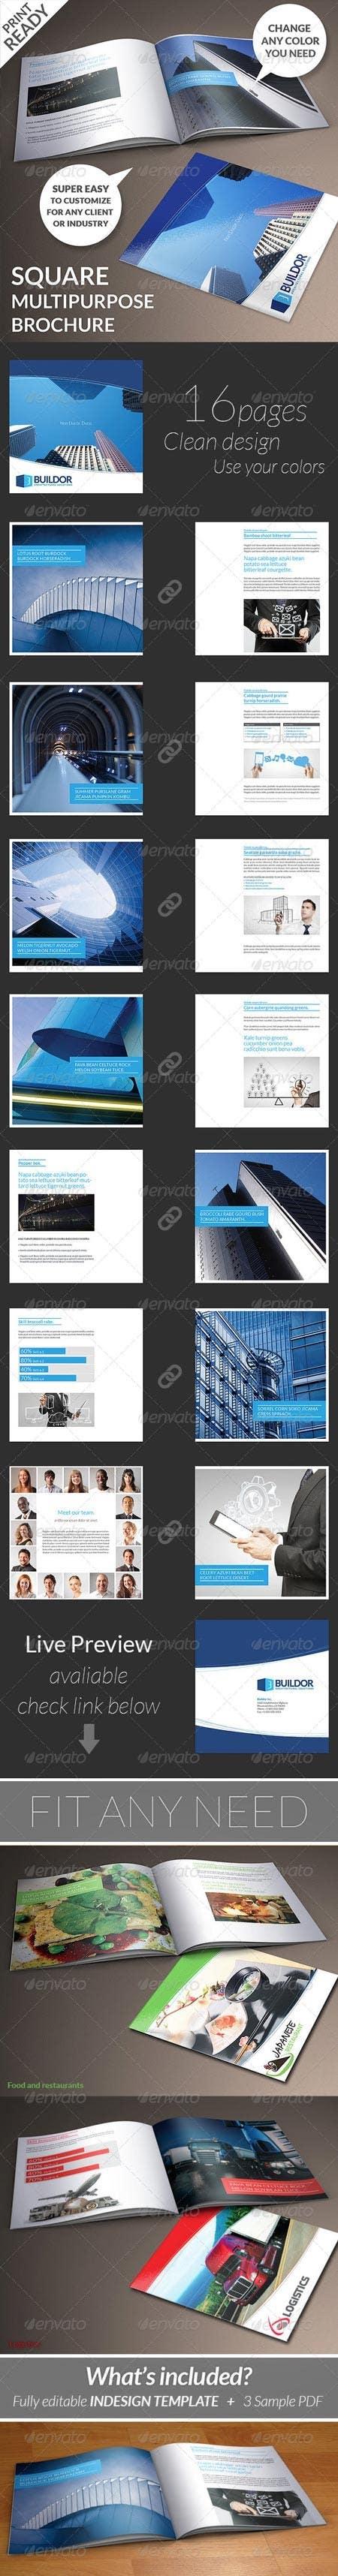 Konkurrenceindlæg #7 for Design a Brochure for mailboxesflorida.com